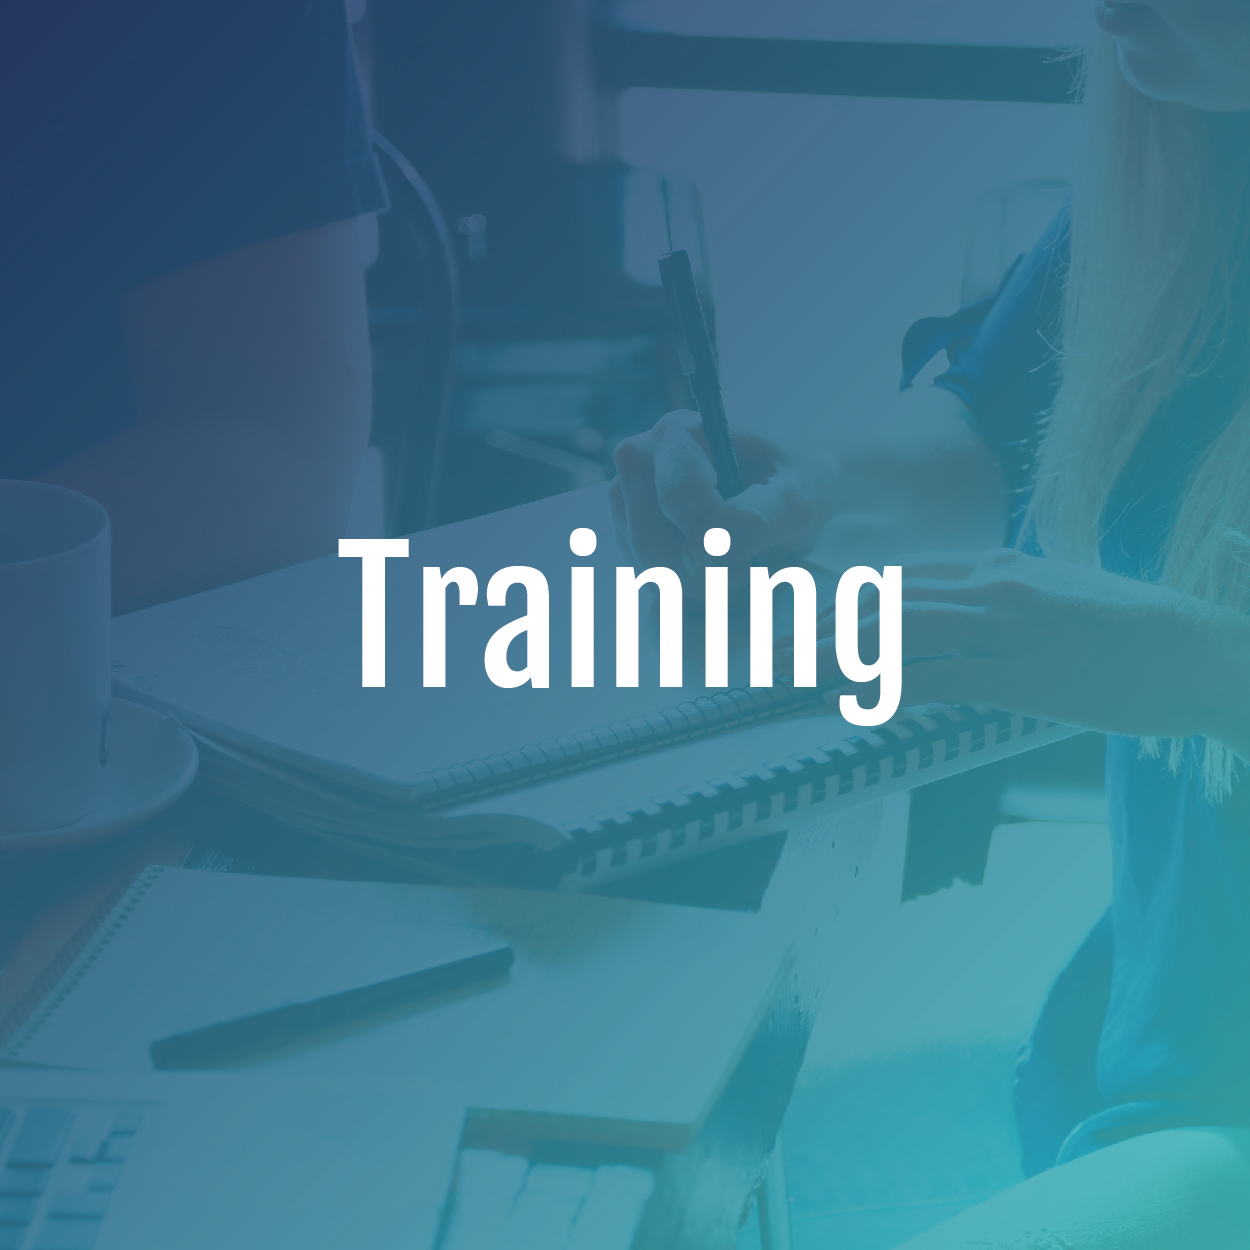 training-01.jpg